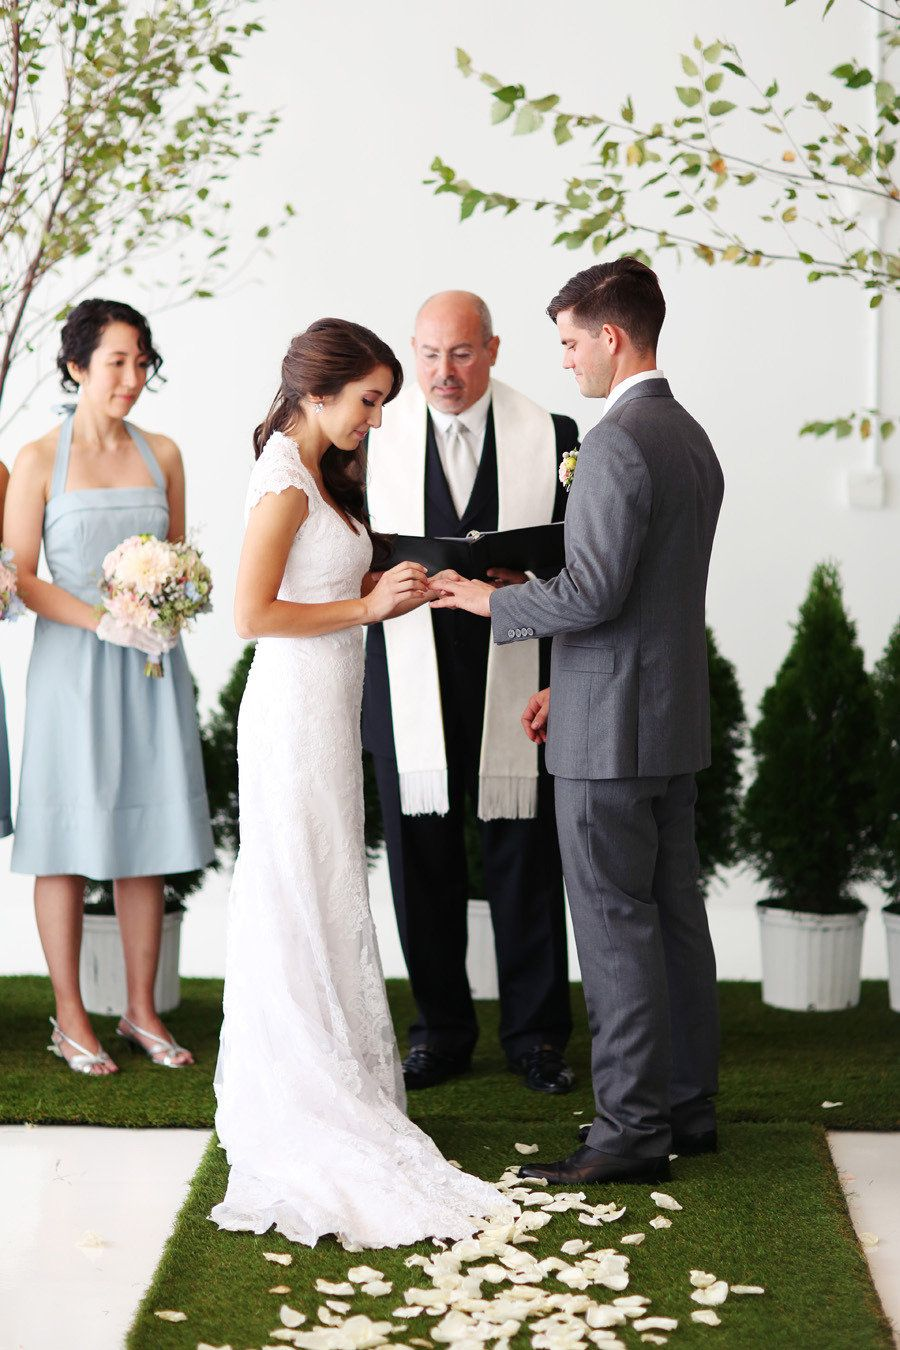 Best dress to wear to a garden wedding  NYC Indoor Garden Wedding from Angelica Glass  Floral designs